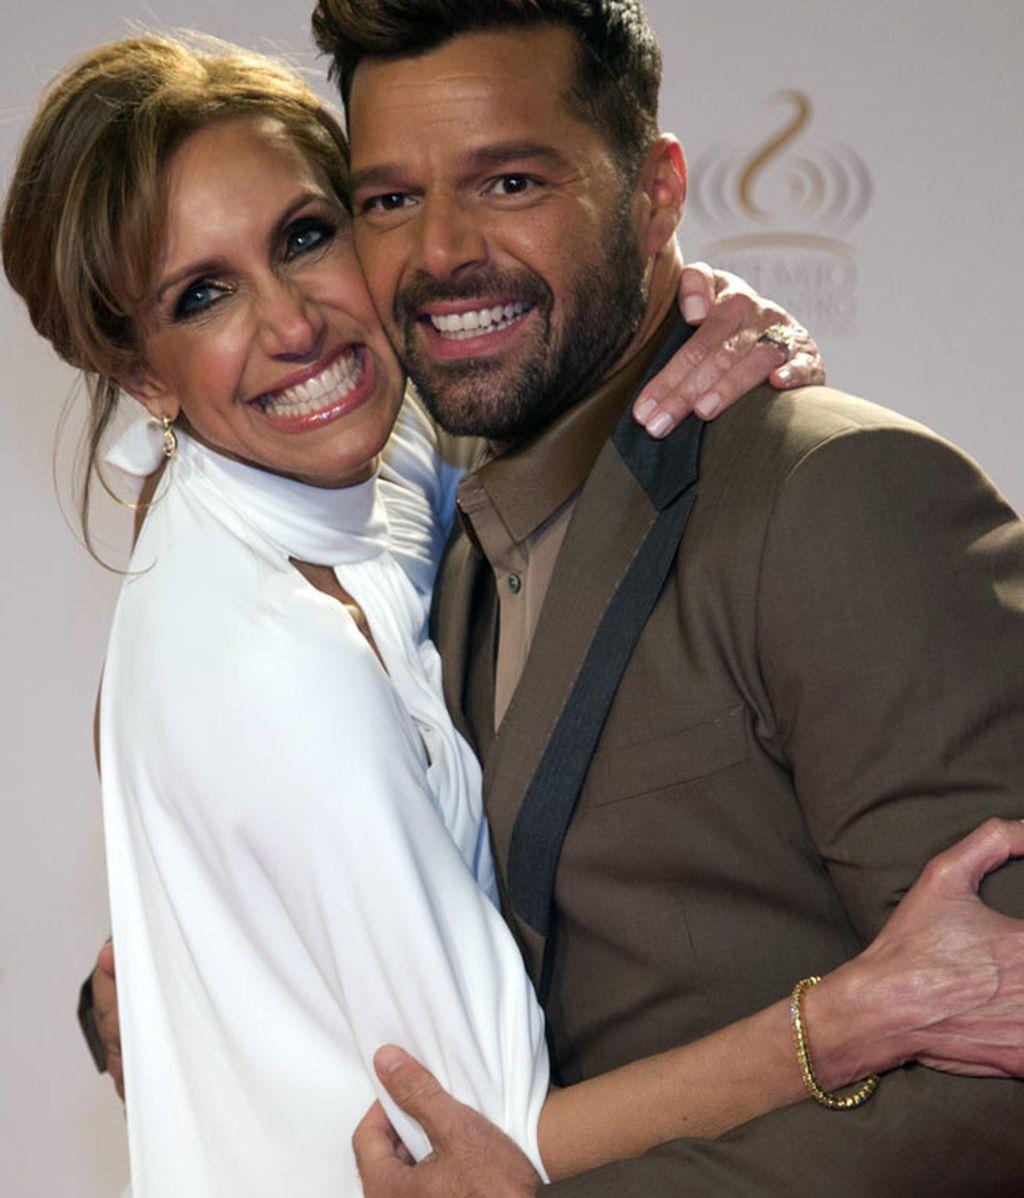 La modelo Lili Stefan y Ricky Martin, muy sonrientes